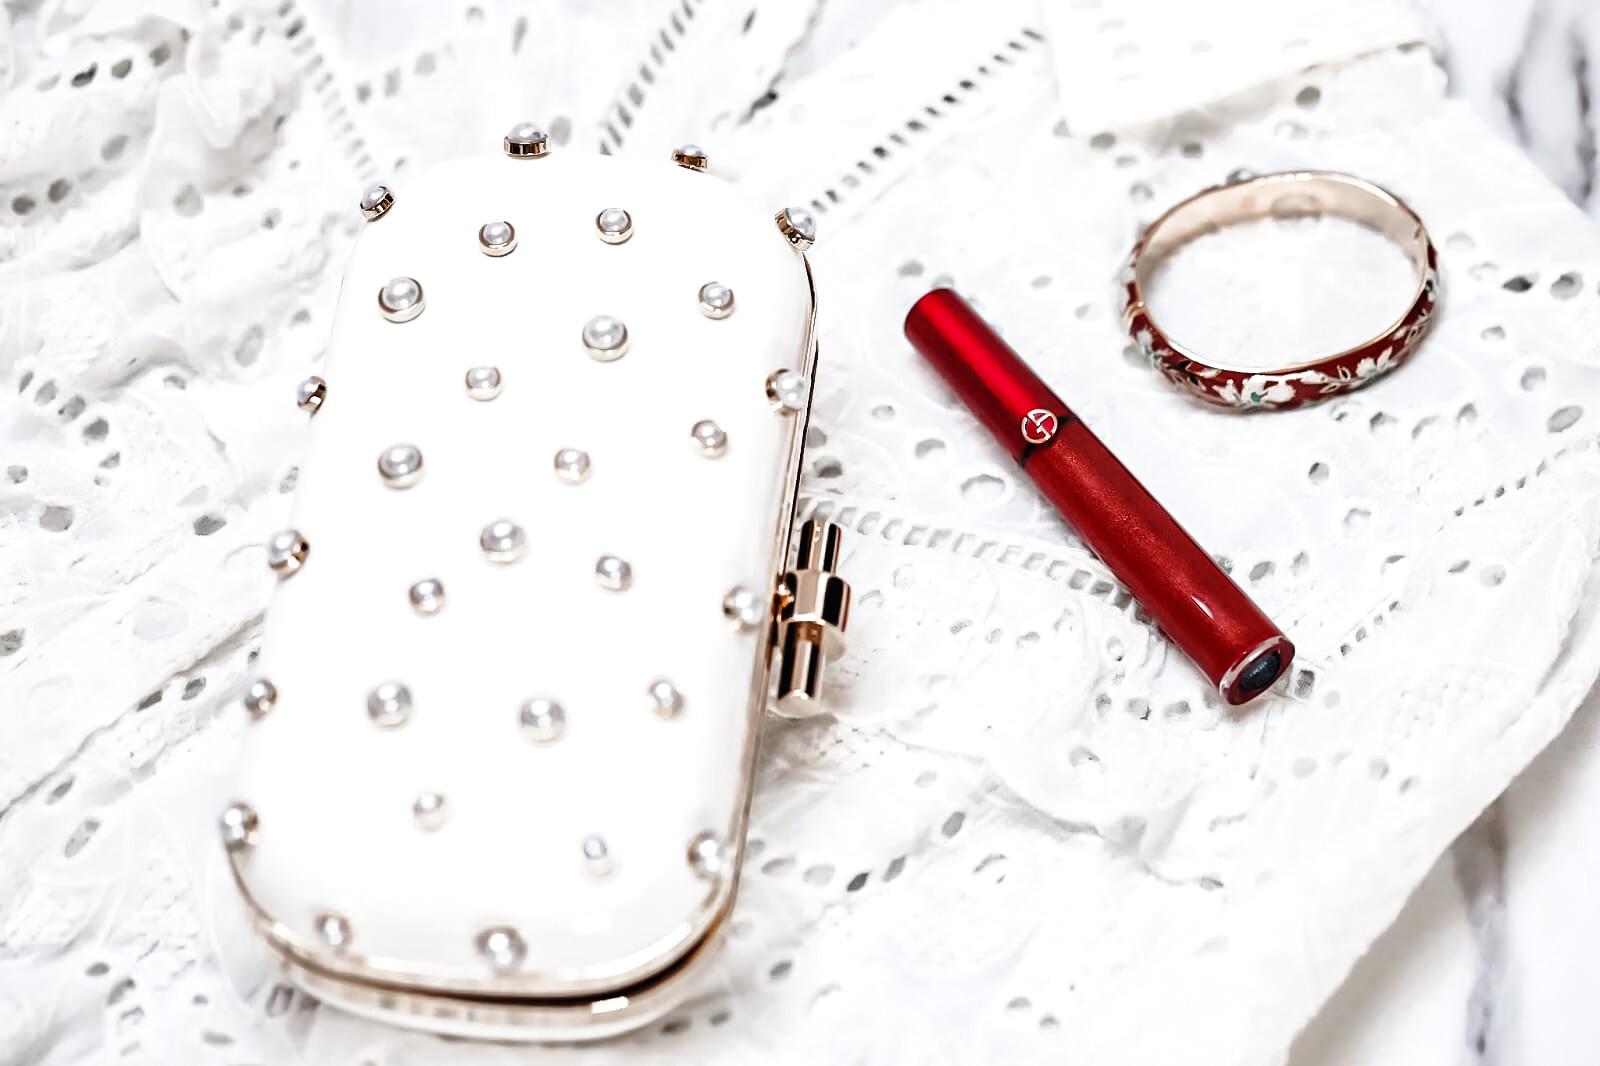 Armani Lip Maestro 103 526 527 209 400 405 G Swatch Avis